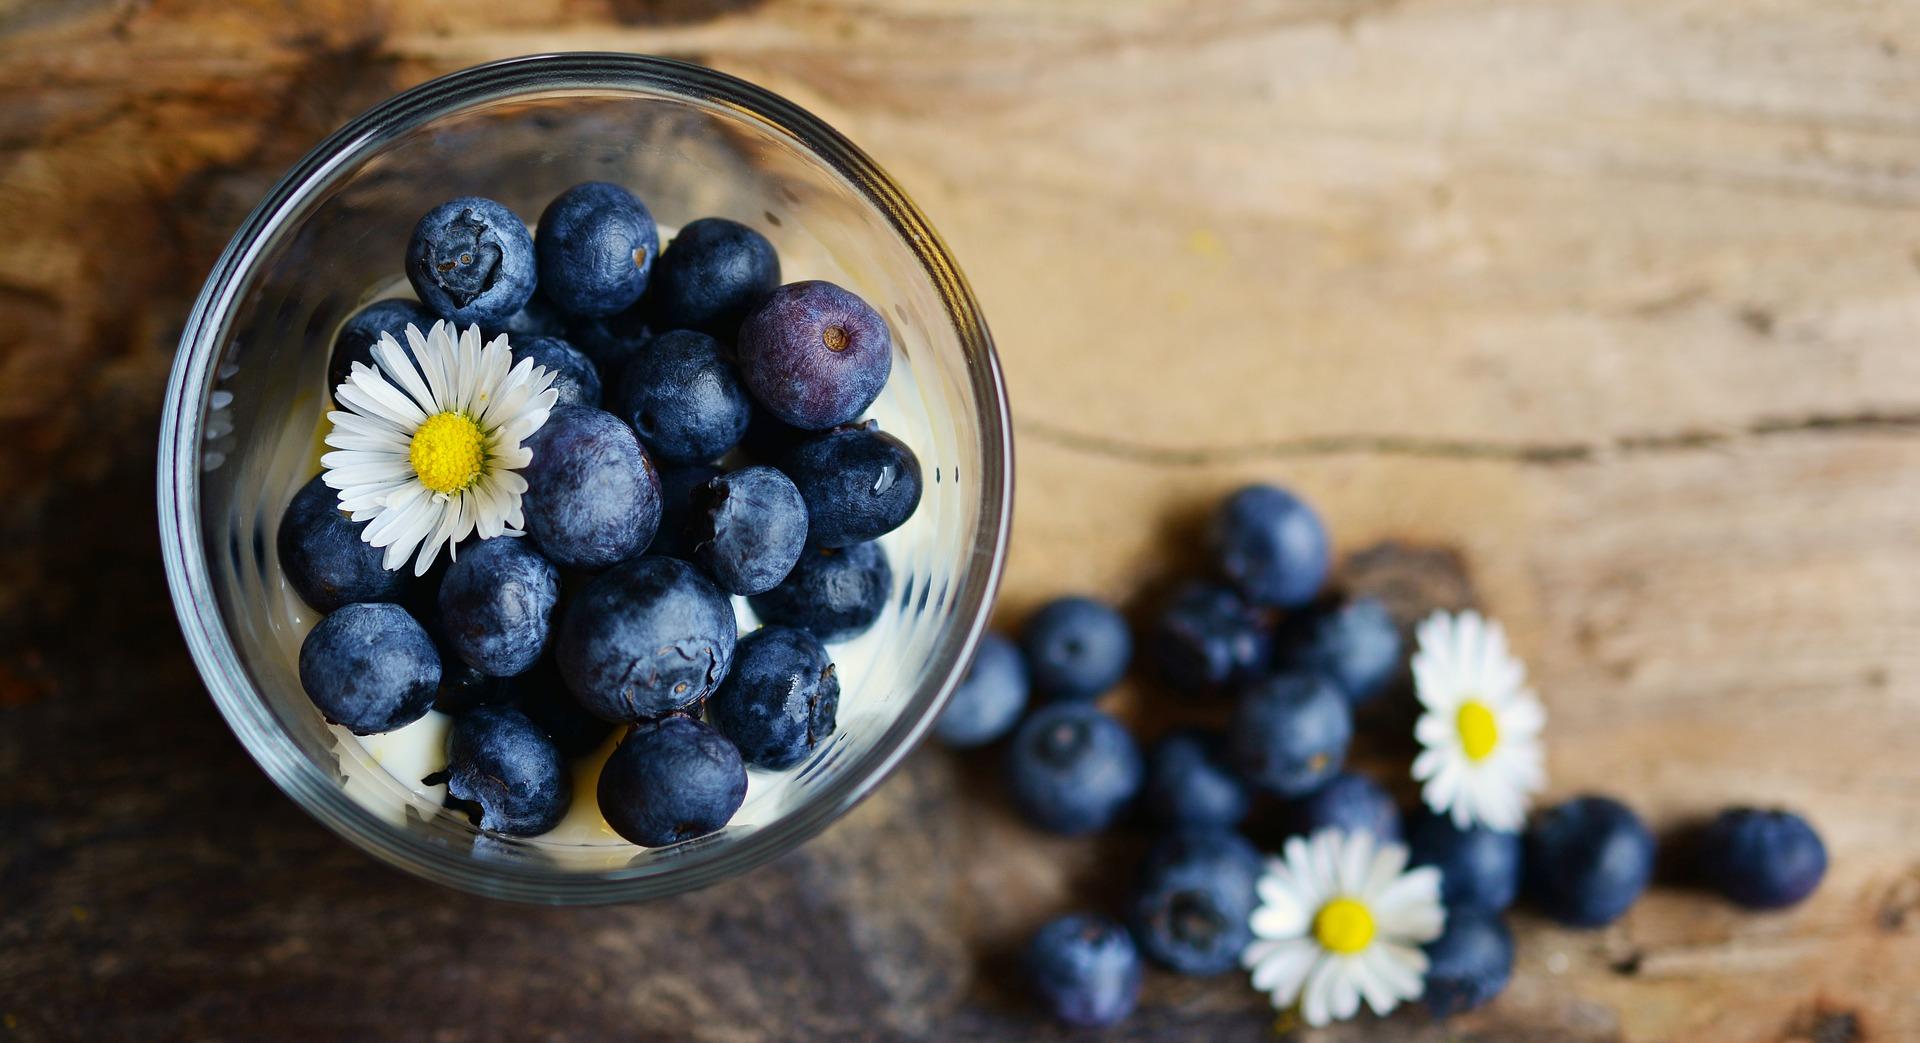 blueberries-2278921_1920.jpg